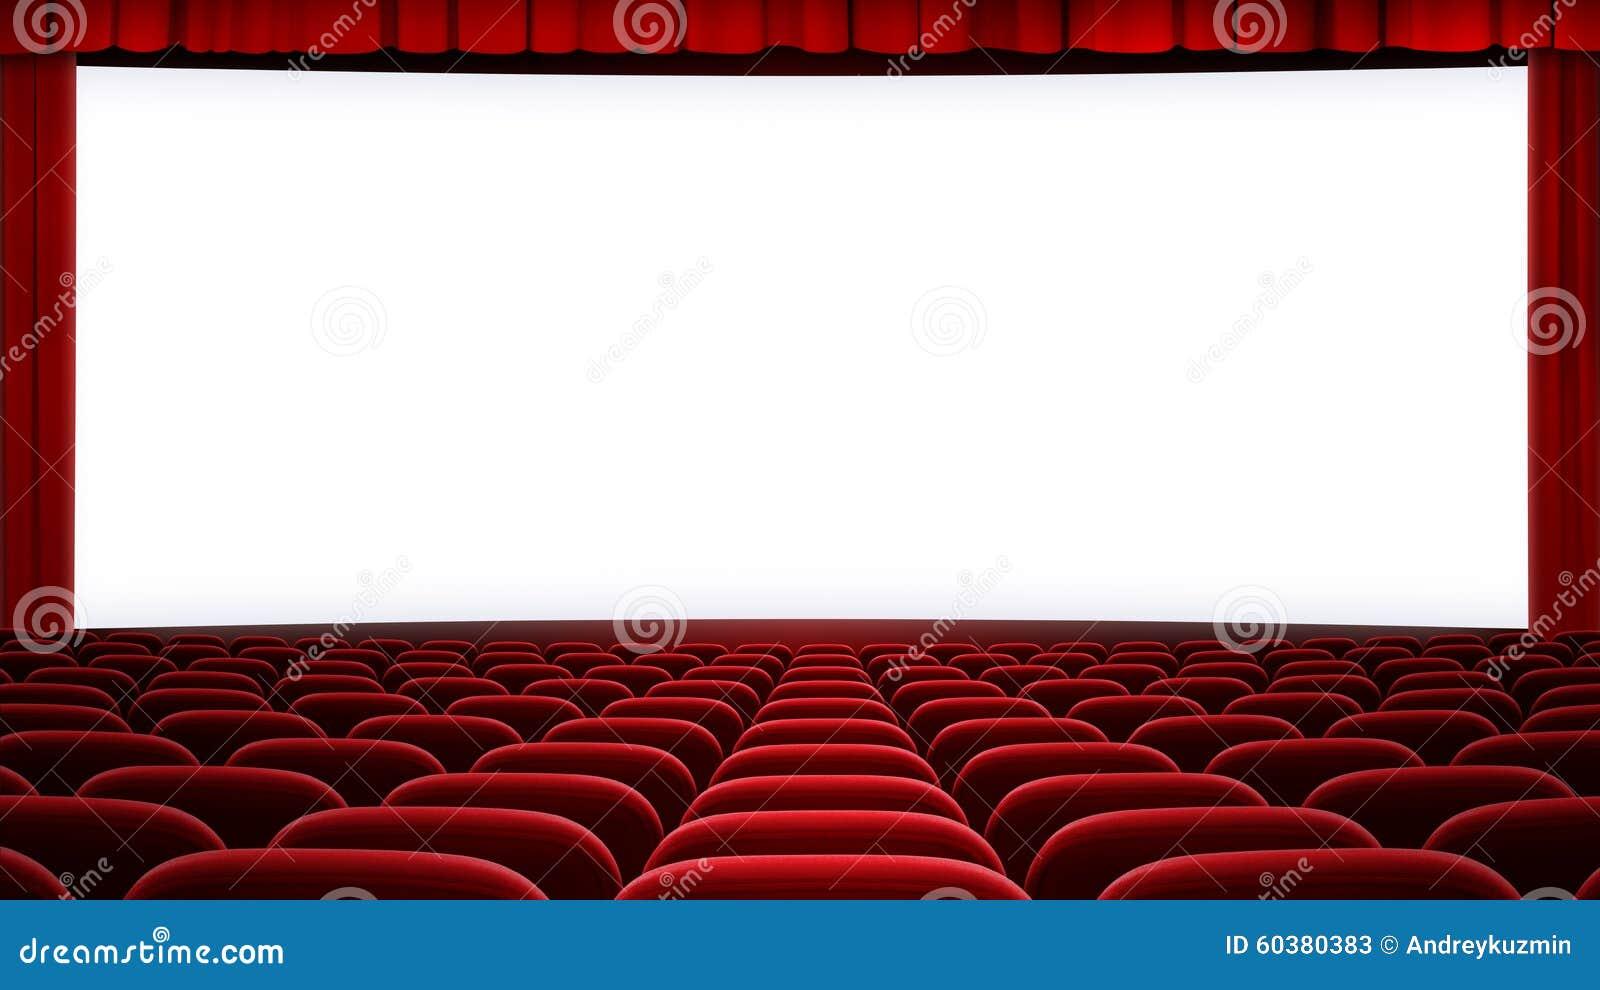 Wide Cinema Screen Backgound Aspect Ratio 16 9 Stock